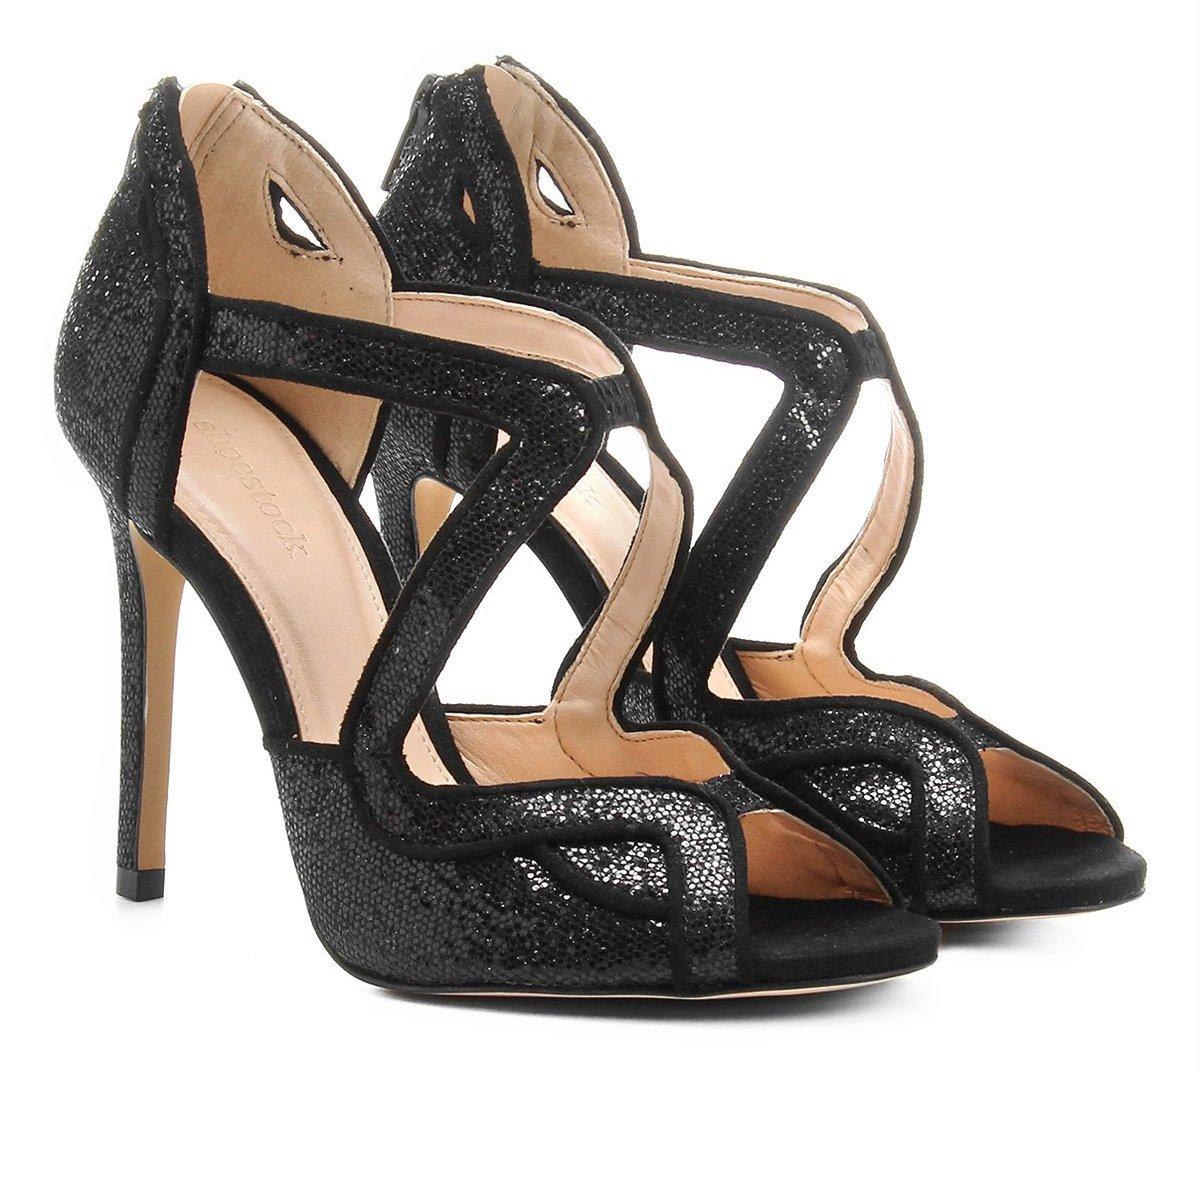 e301ef69a5 Sandália Shoestock Salto Fino Festa Feminina - Compre Agora